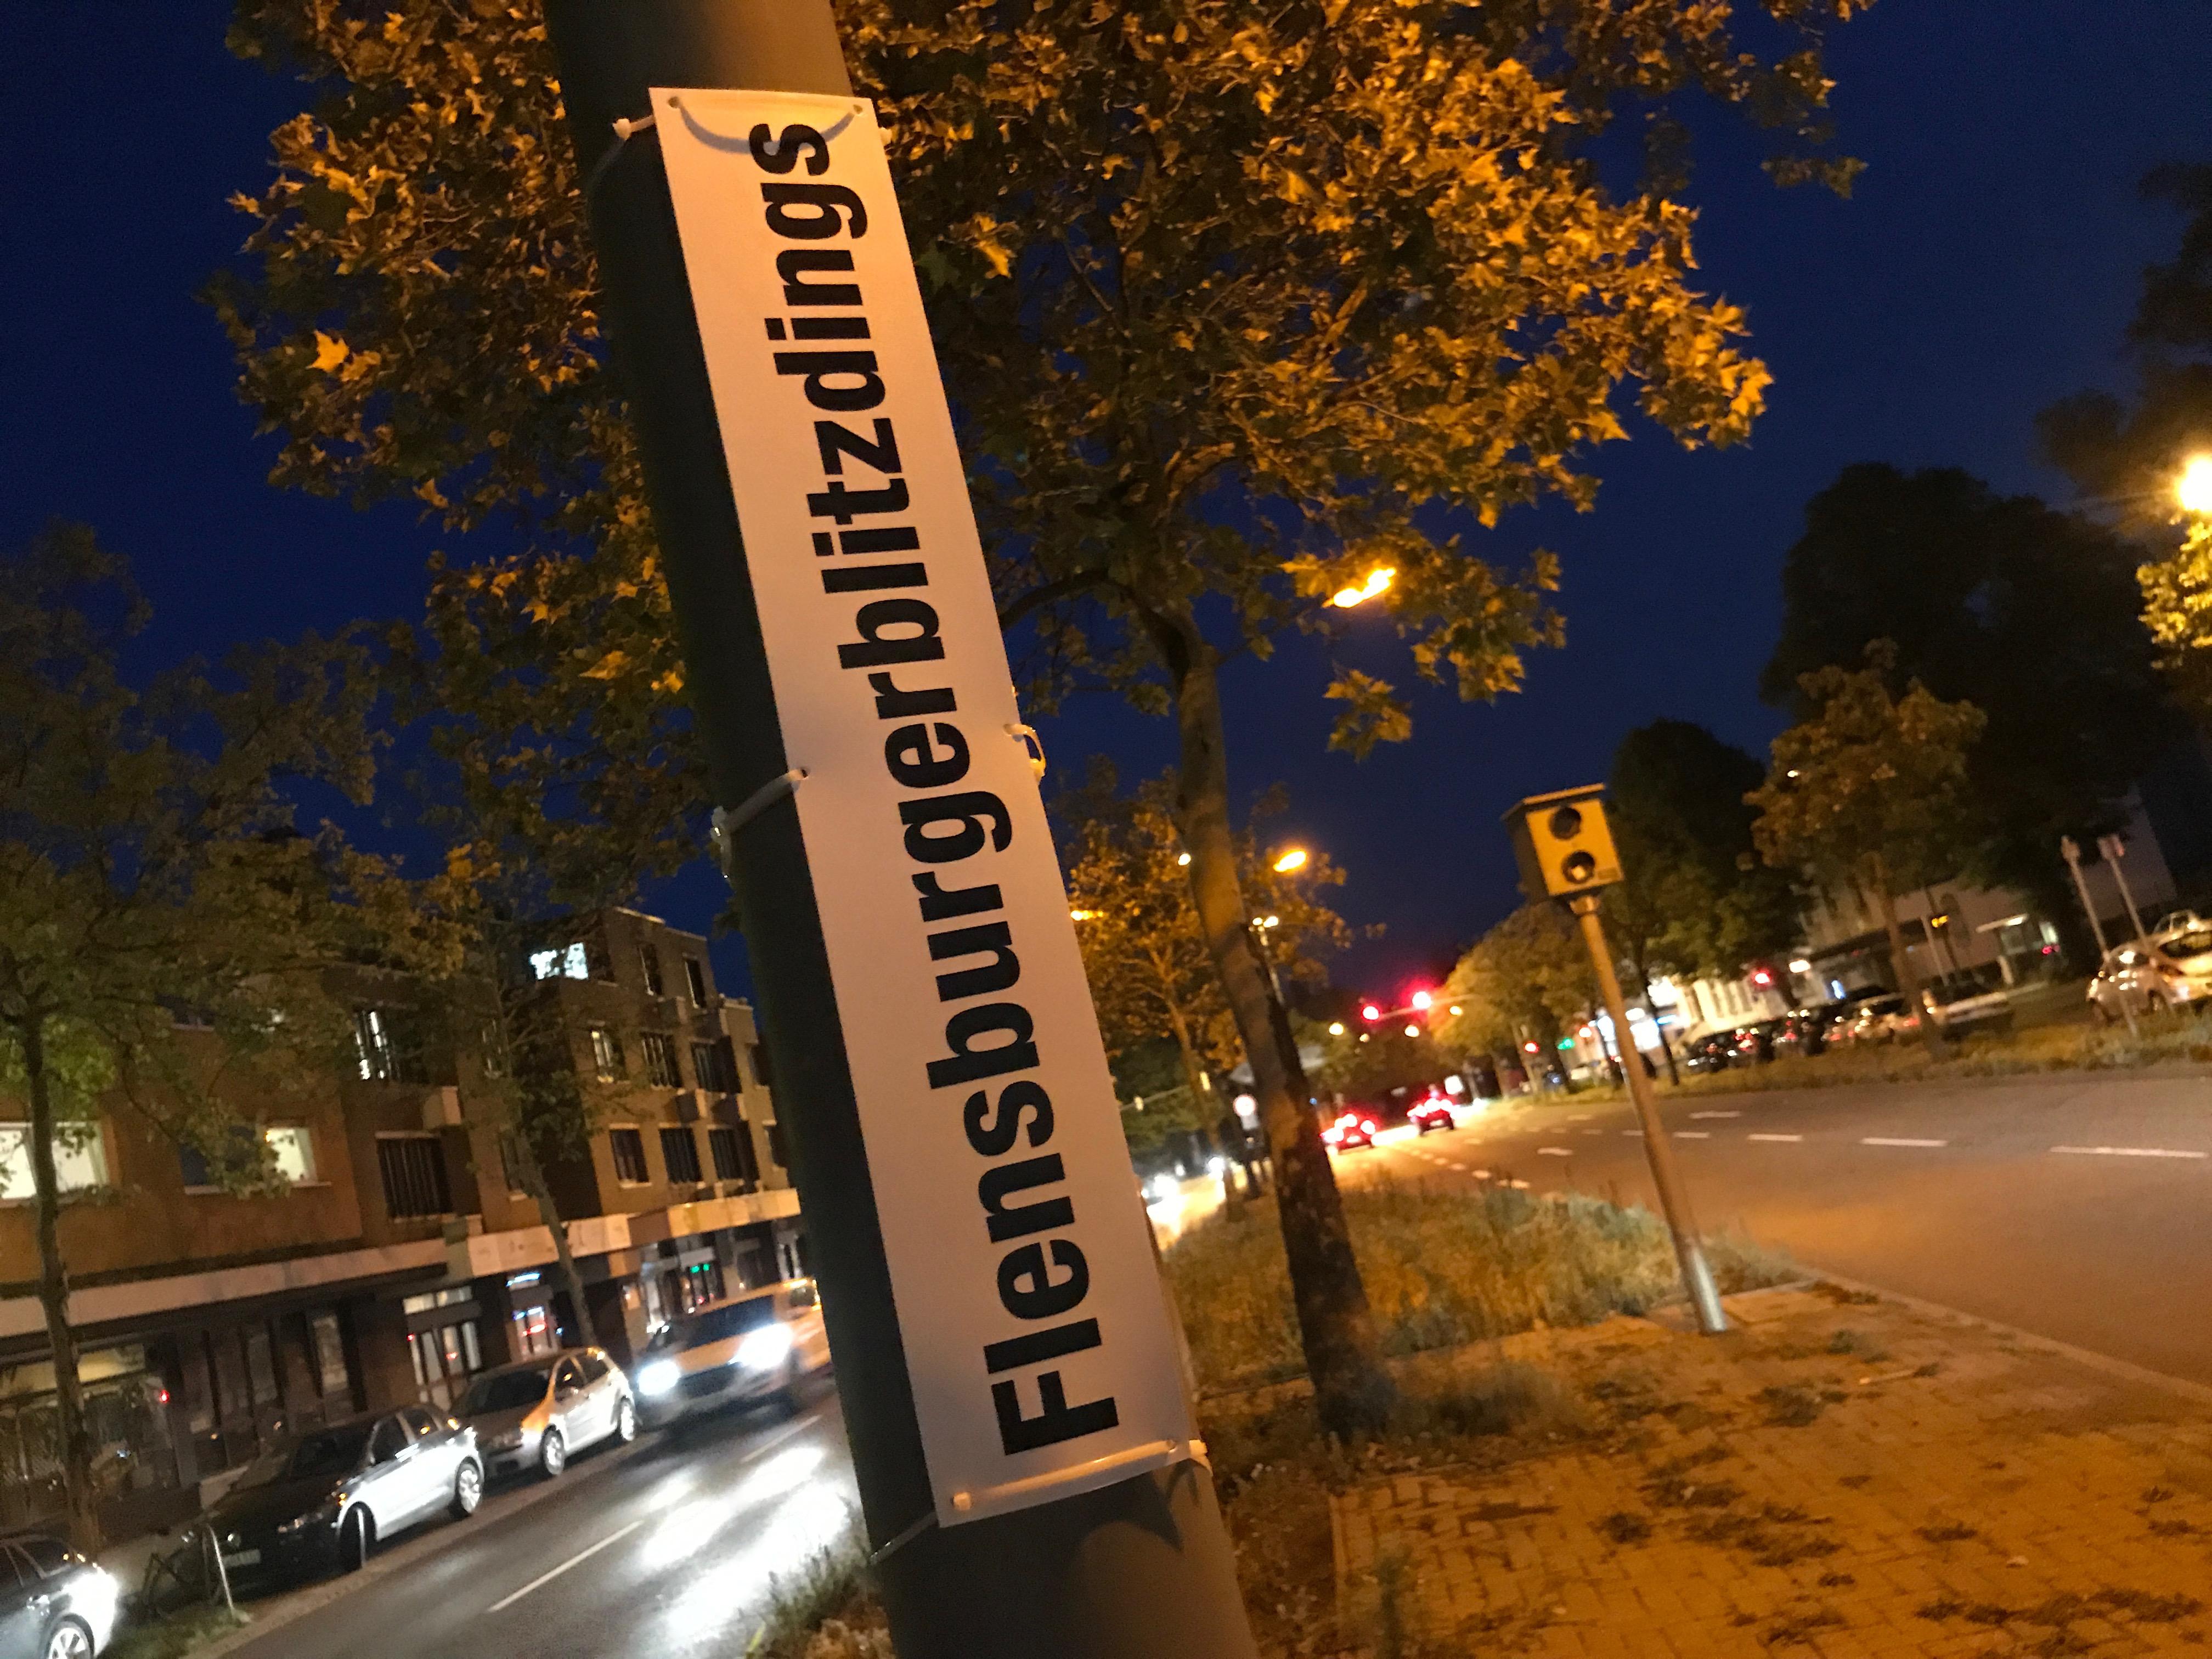 Flensburgerblitzdings